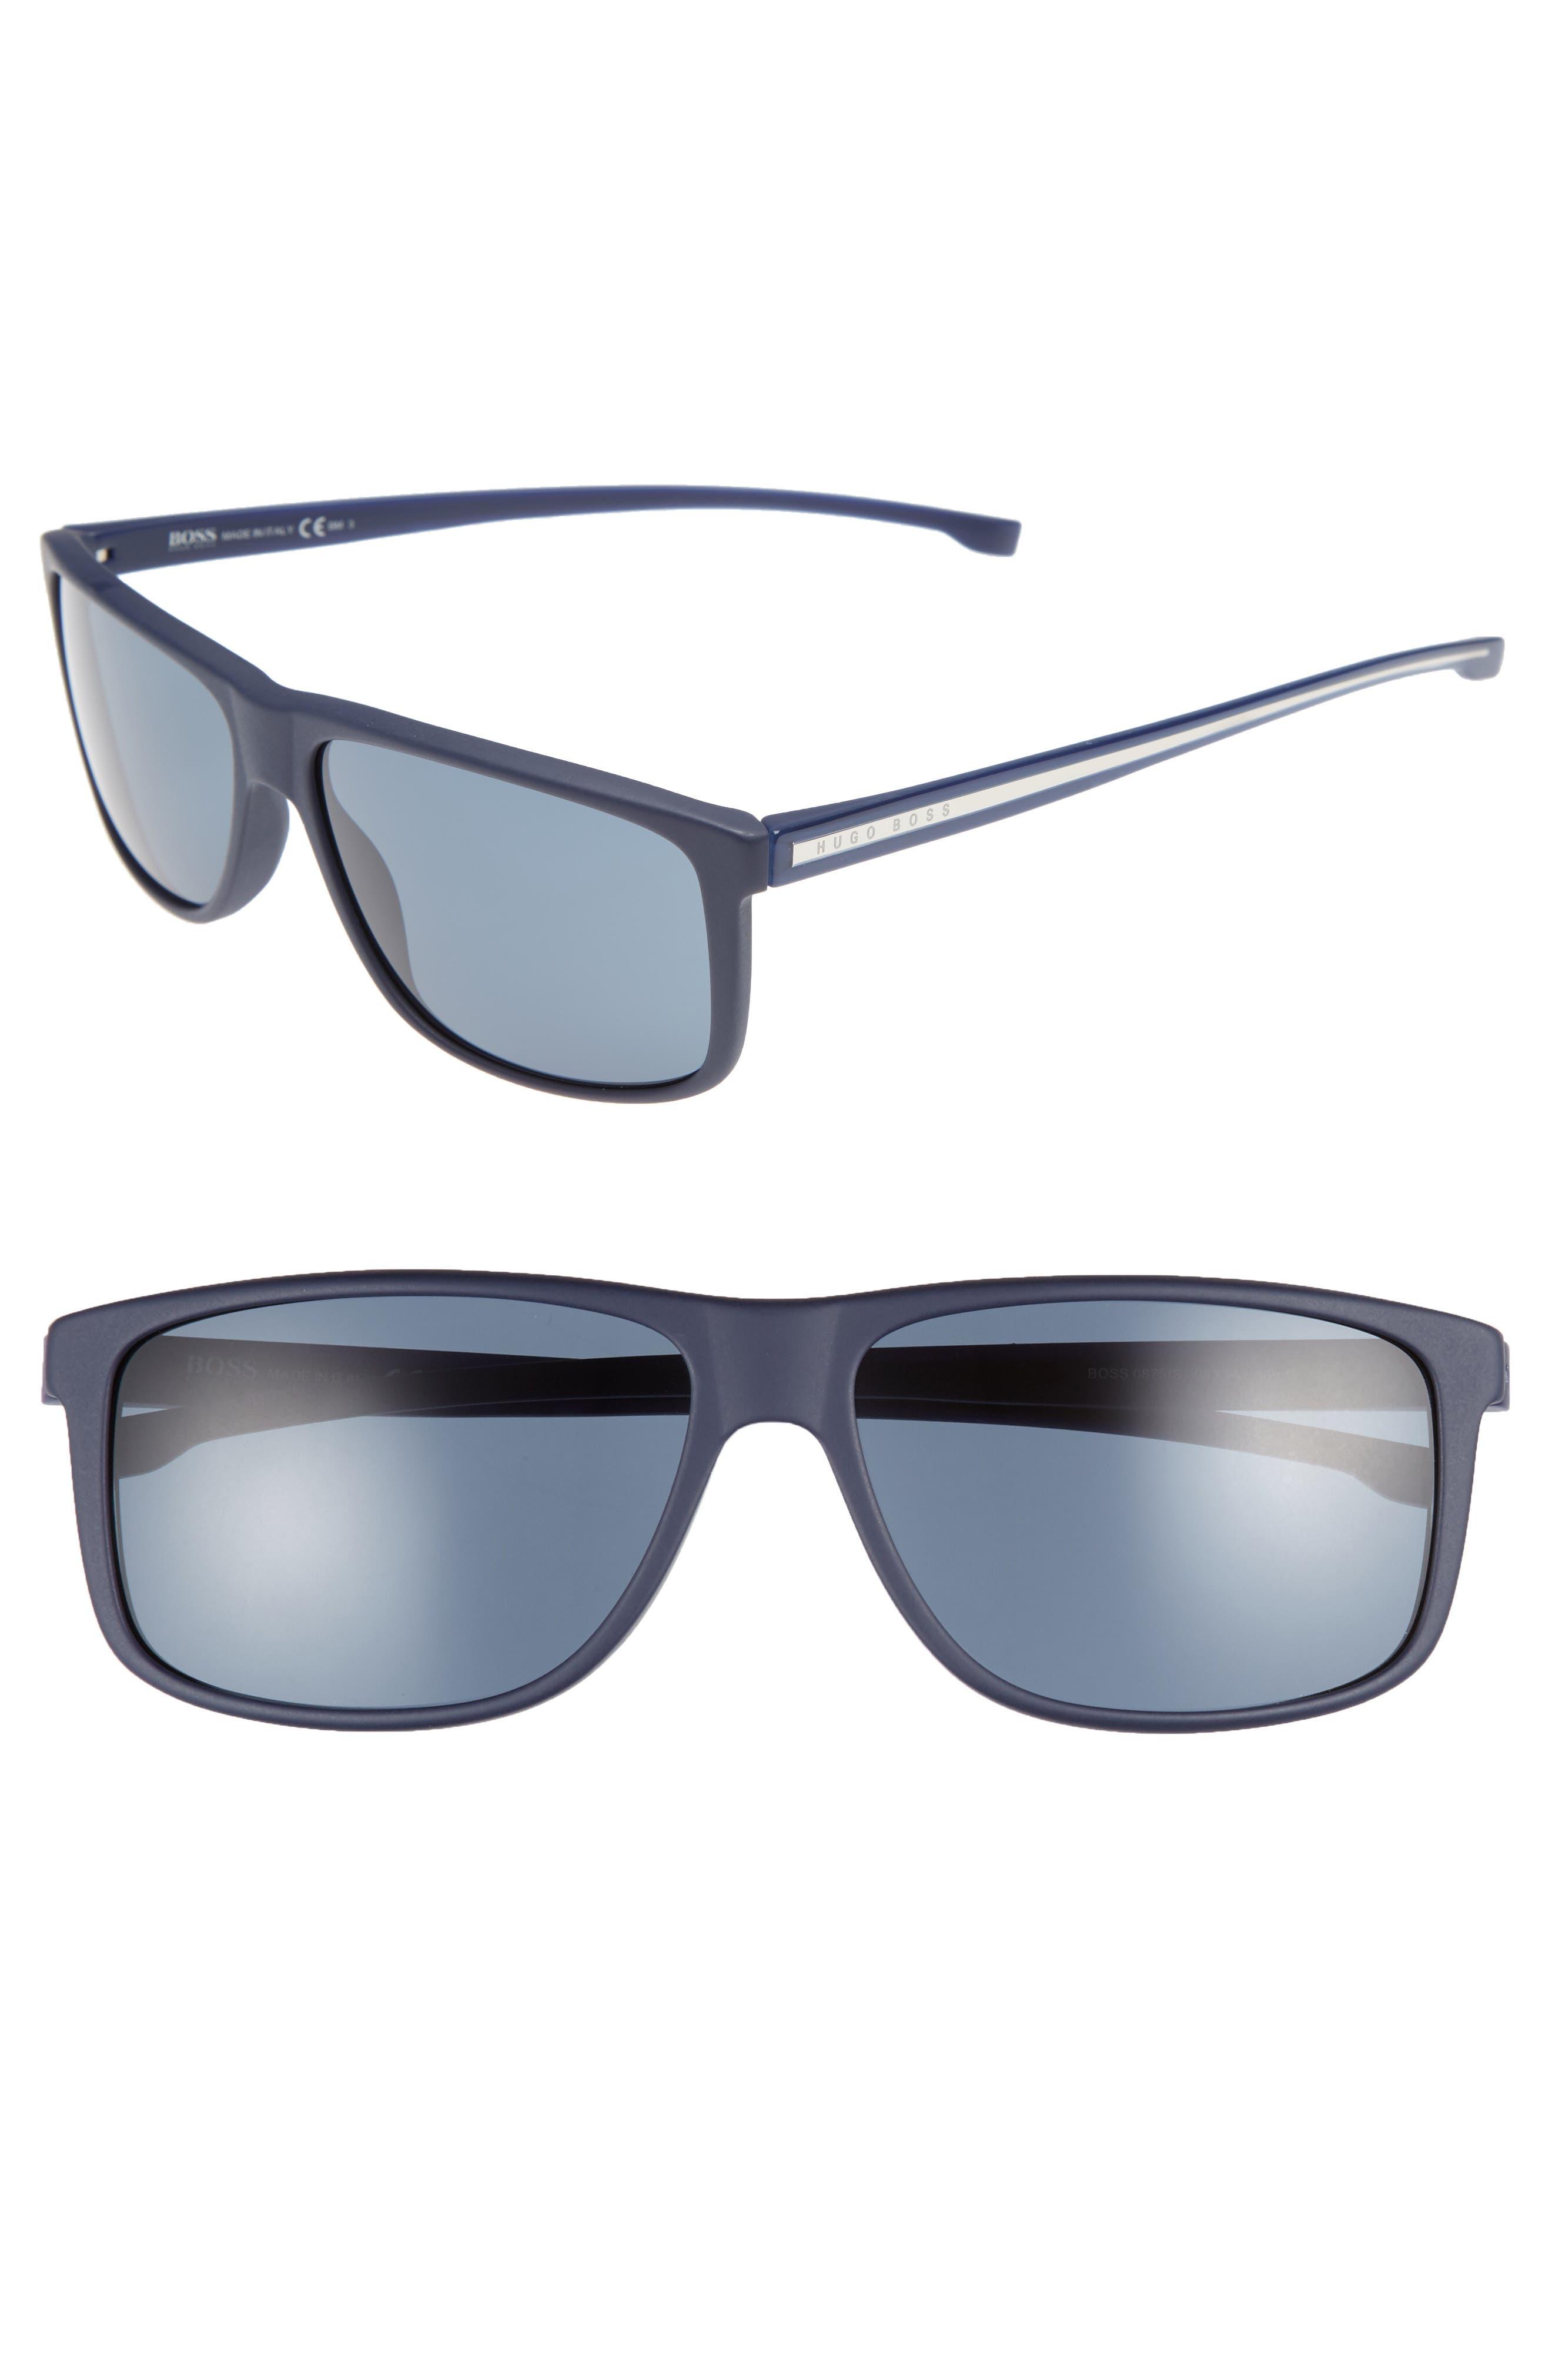 60mm Sunglasses,                             Main thumbnail 1, color,                             Blue/ Blue